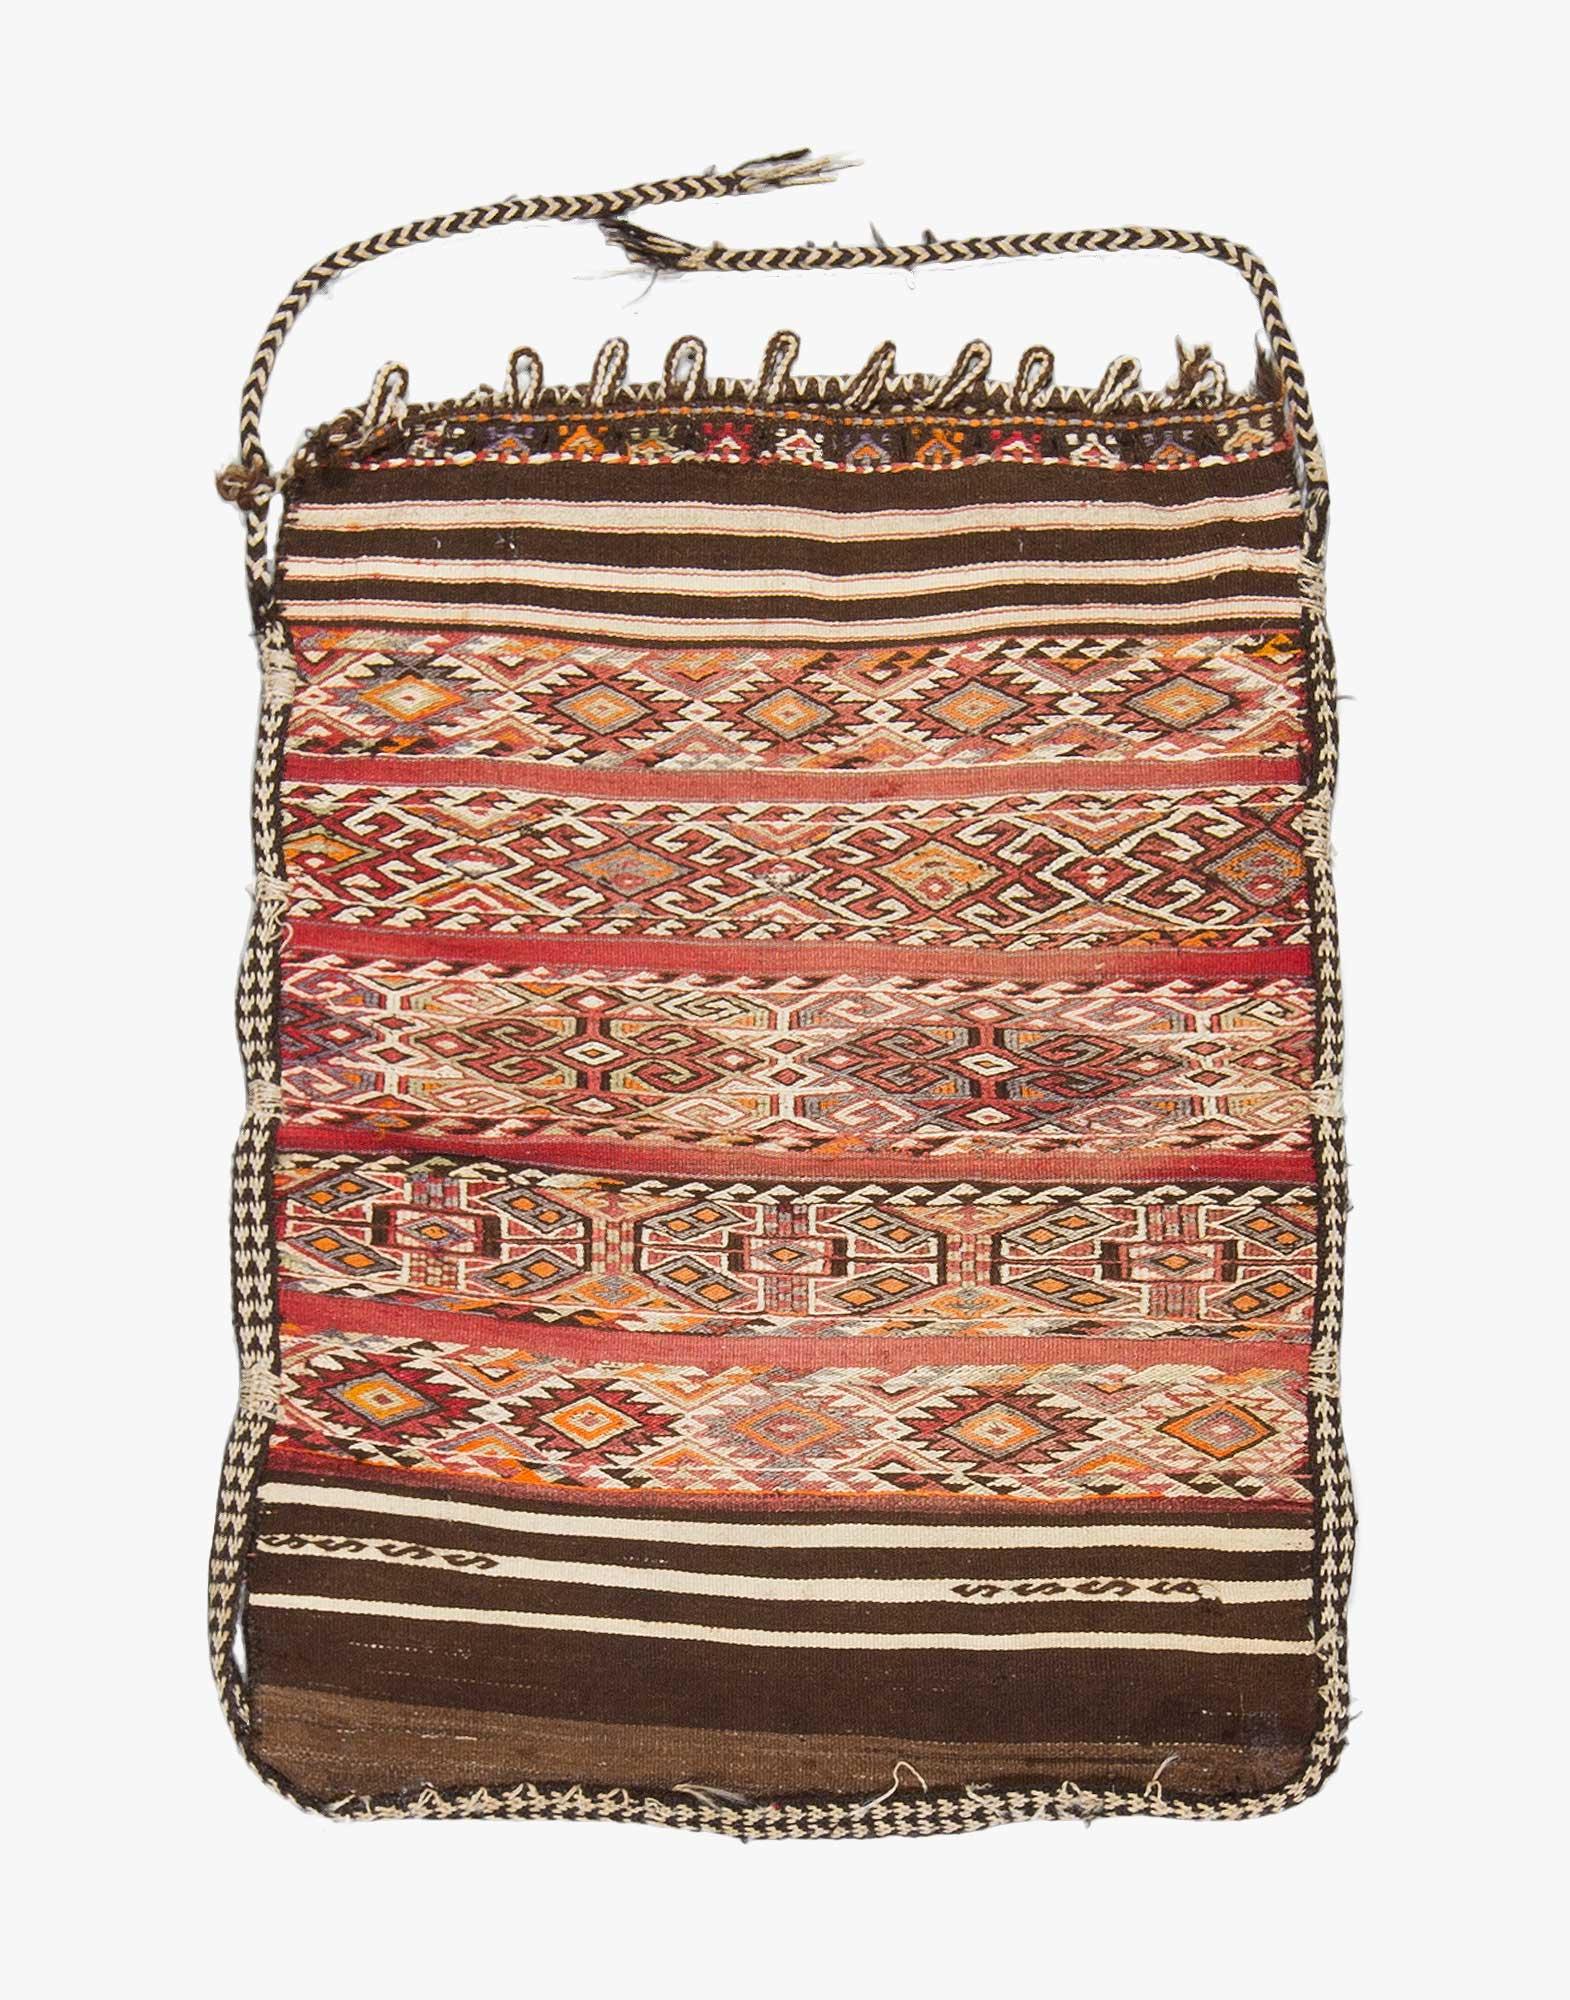 Bergama Camel Chuval Bag